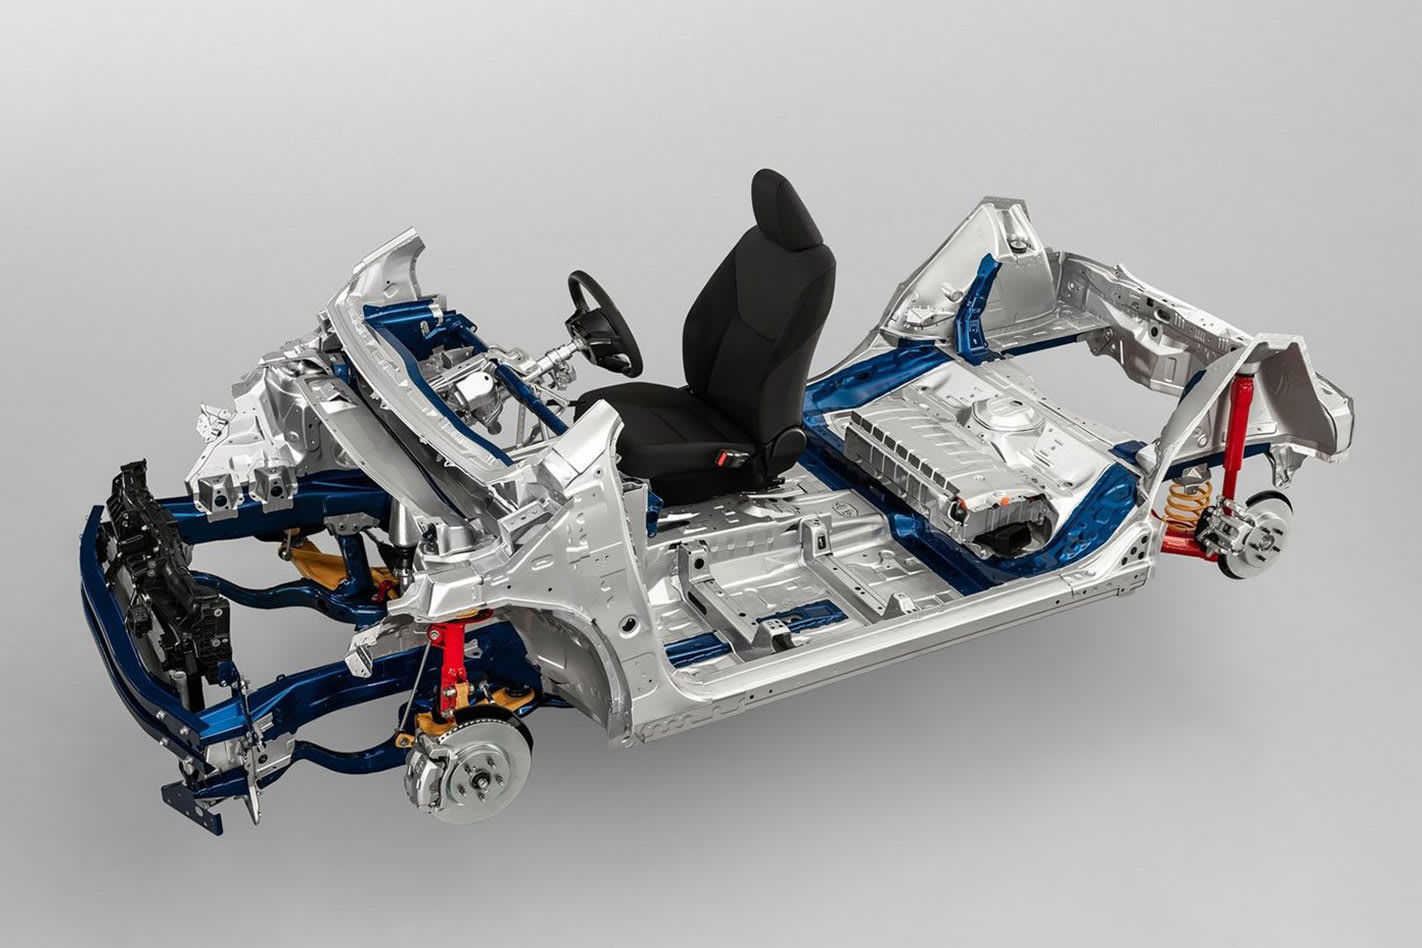 Toyota Yaris hybrid recall